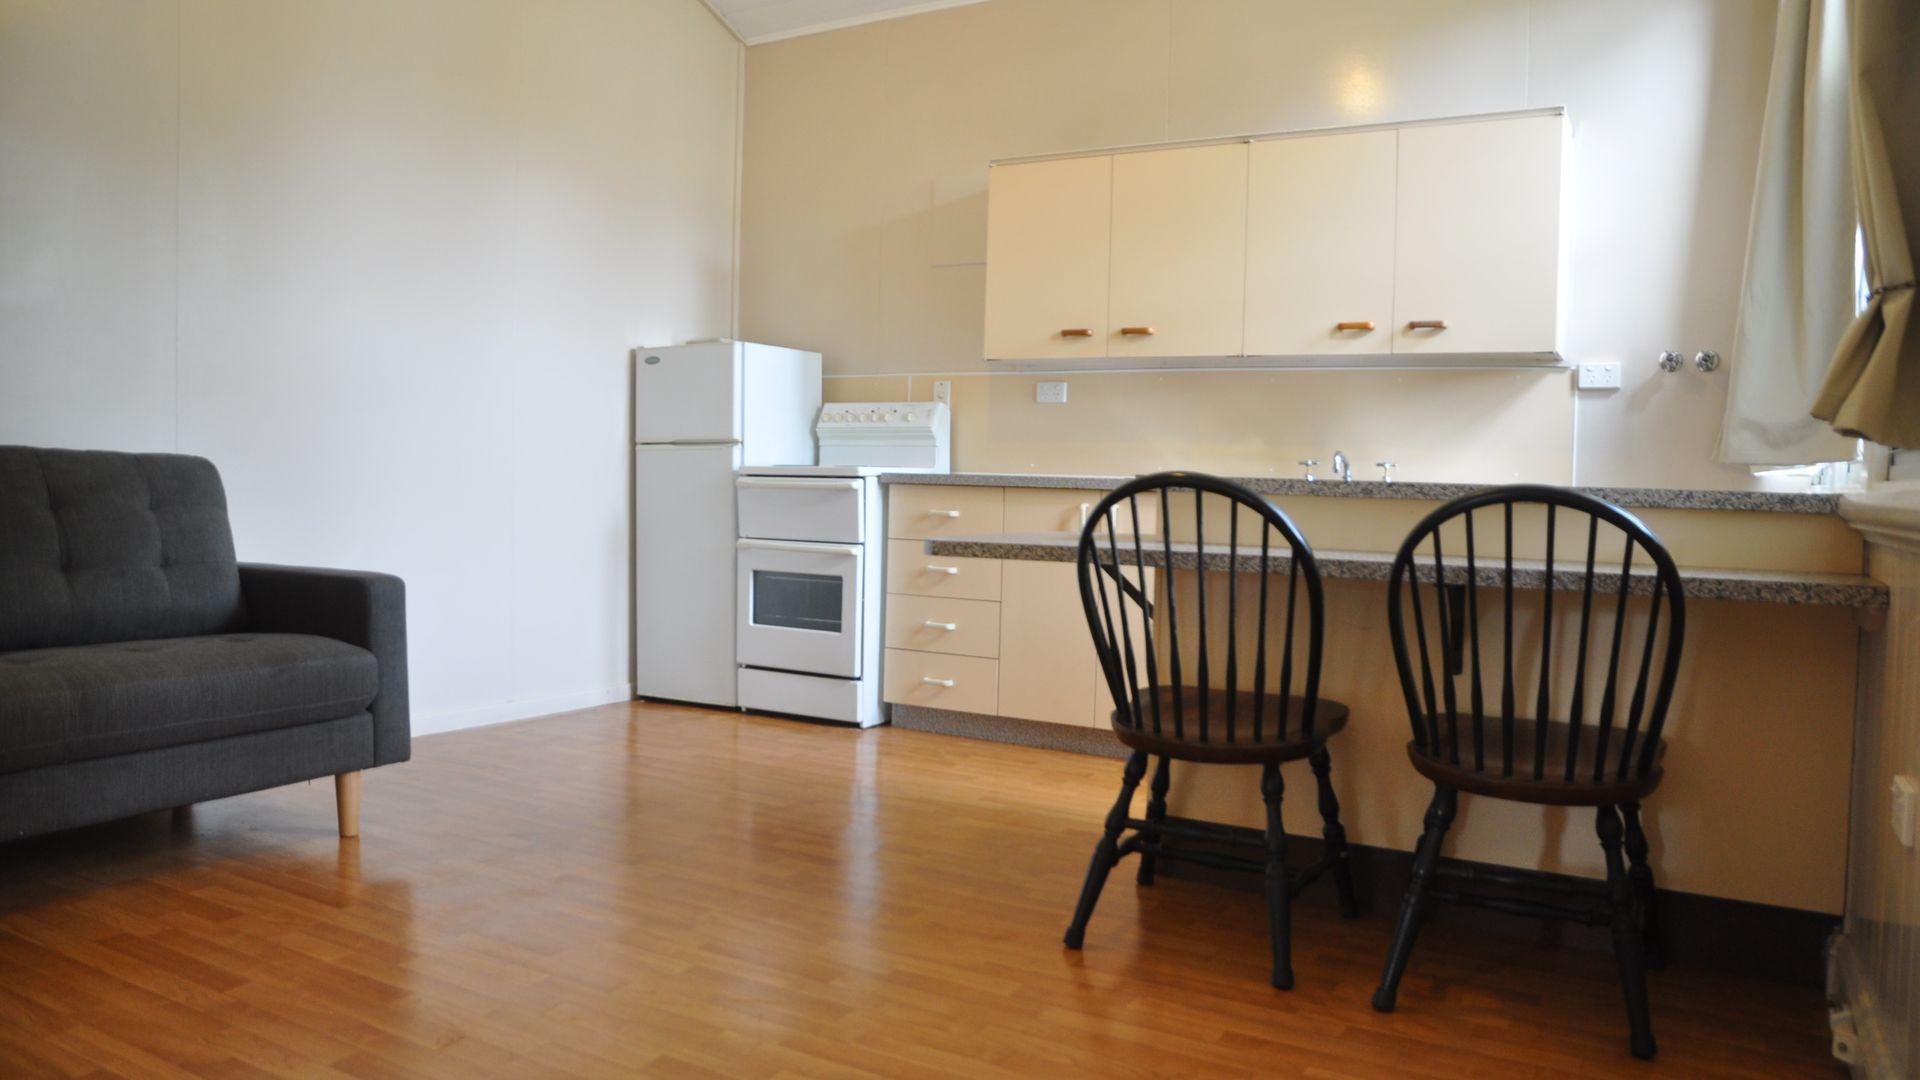 3/26 Lindsay Street, East Toowoomba QLD 4350, Image 1